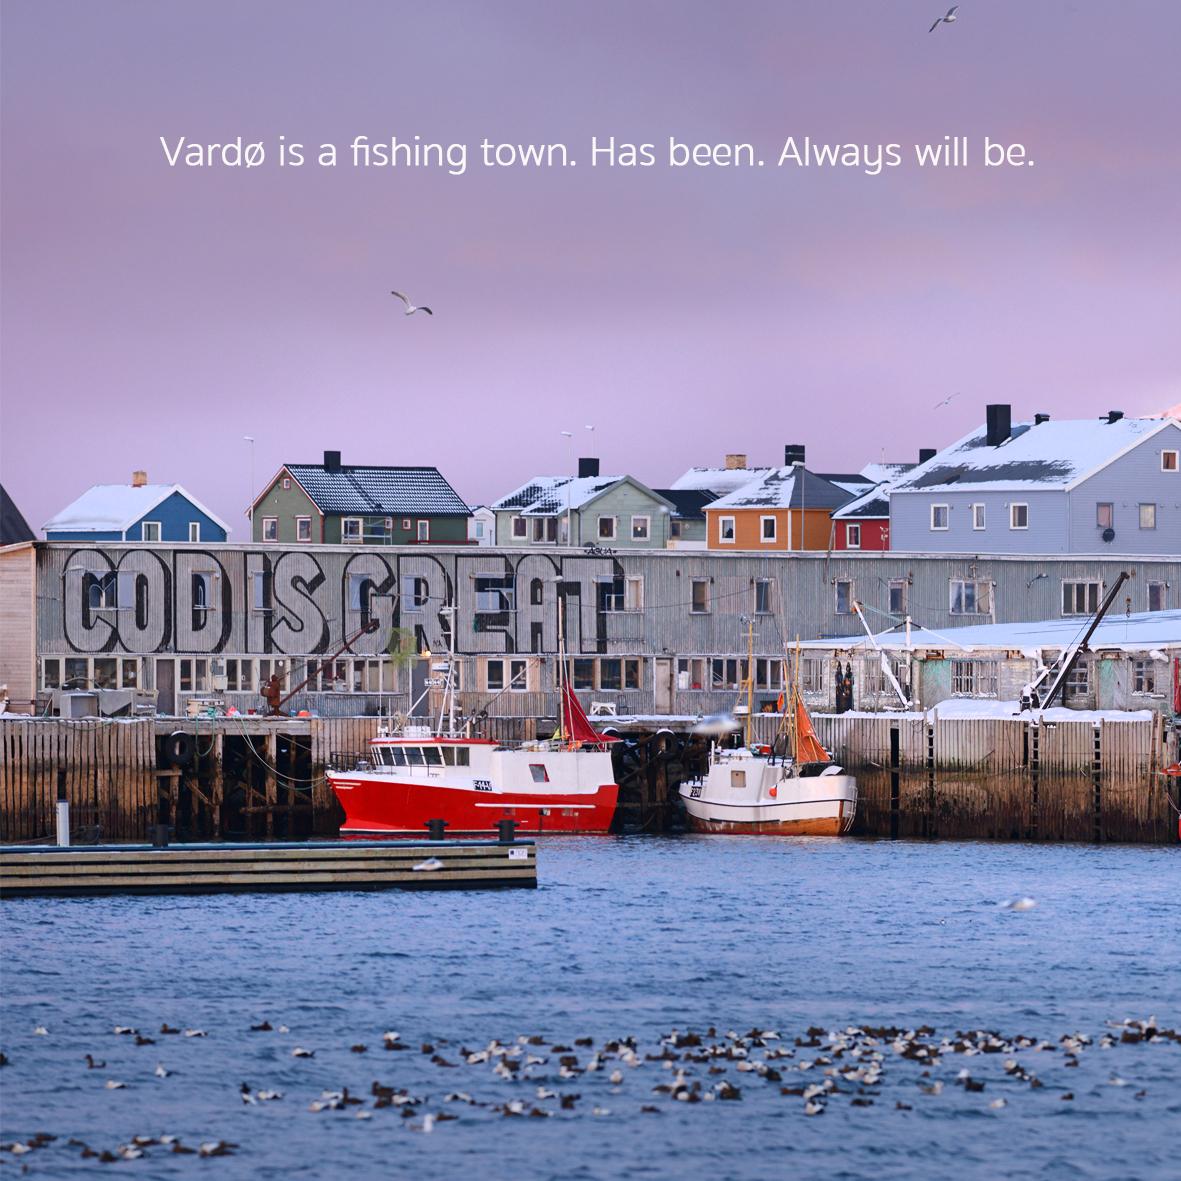 Visit Vardø 8.jpg